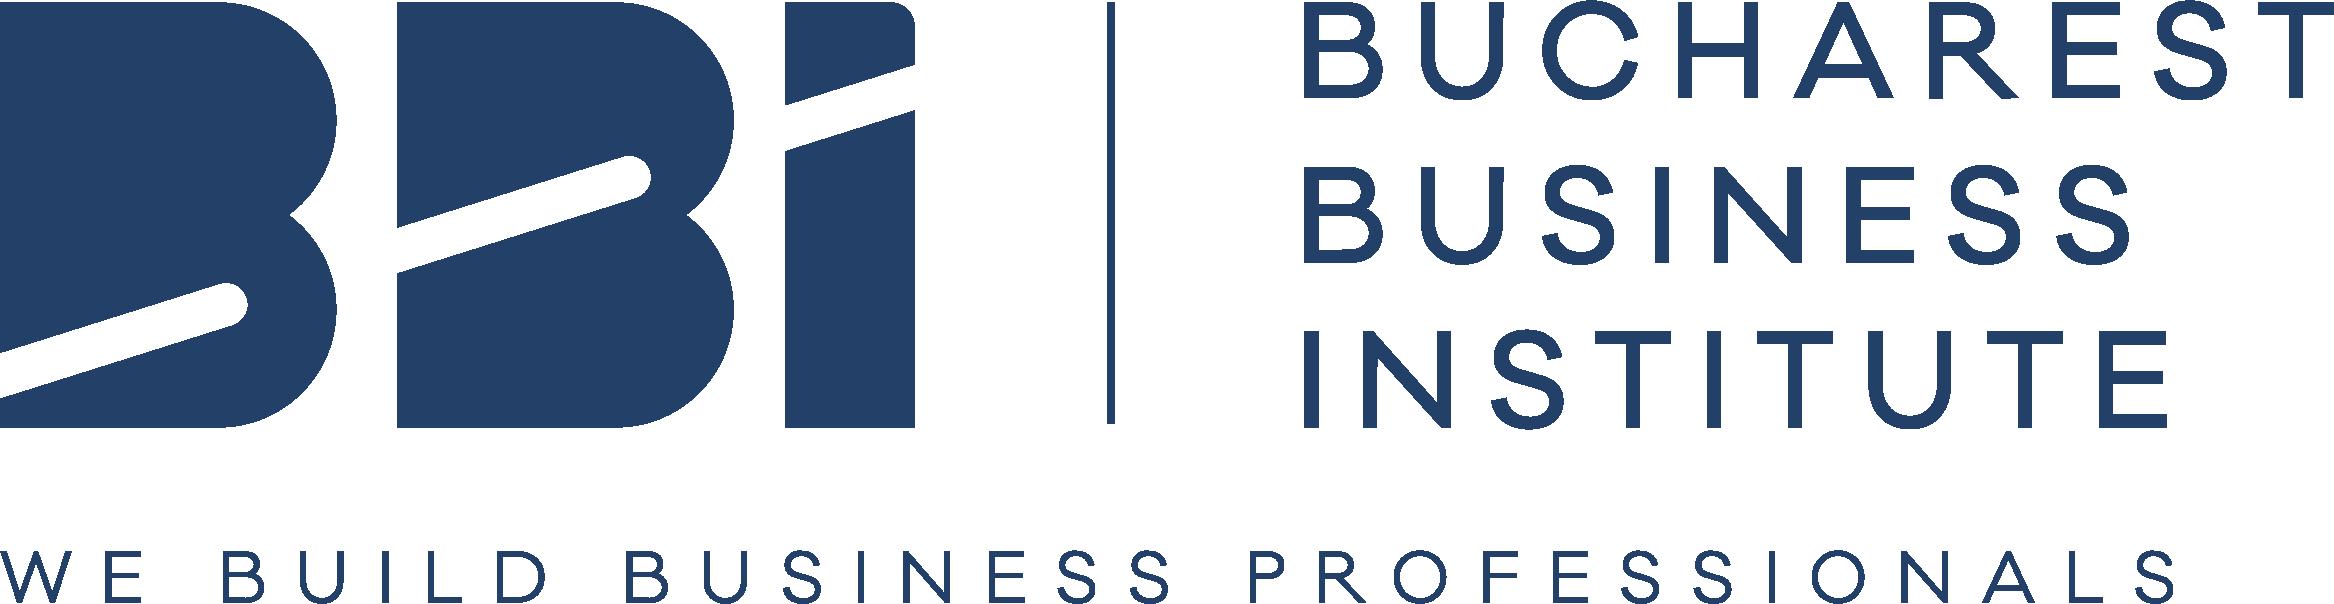 bbi_logo